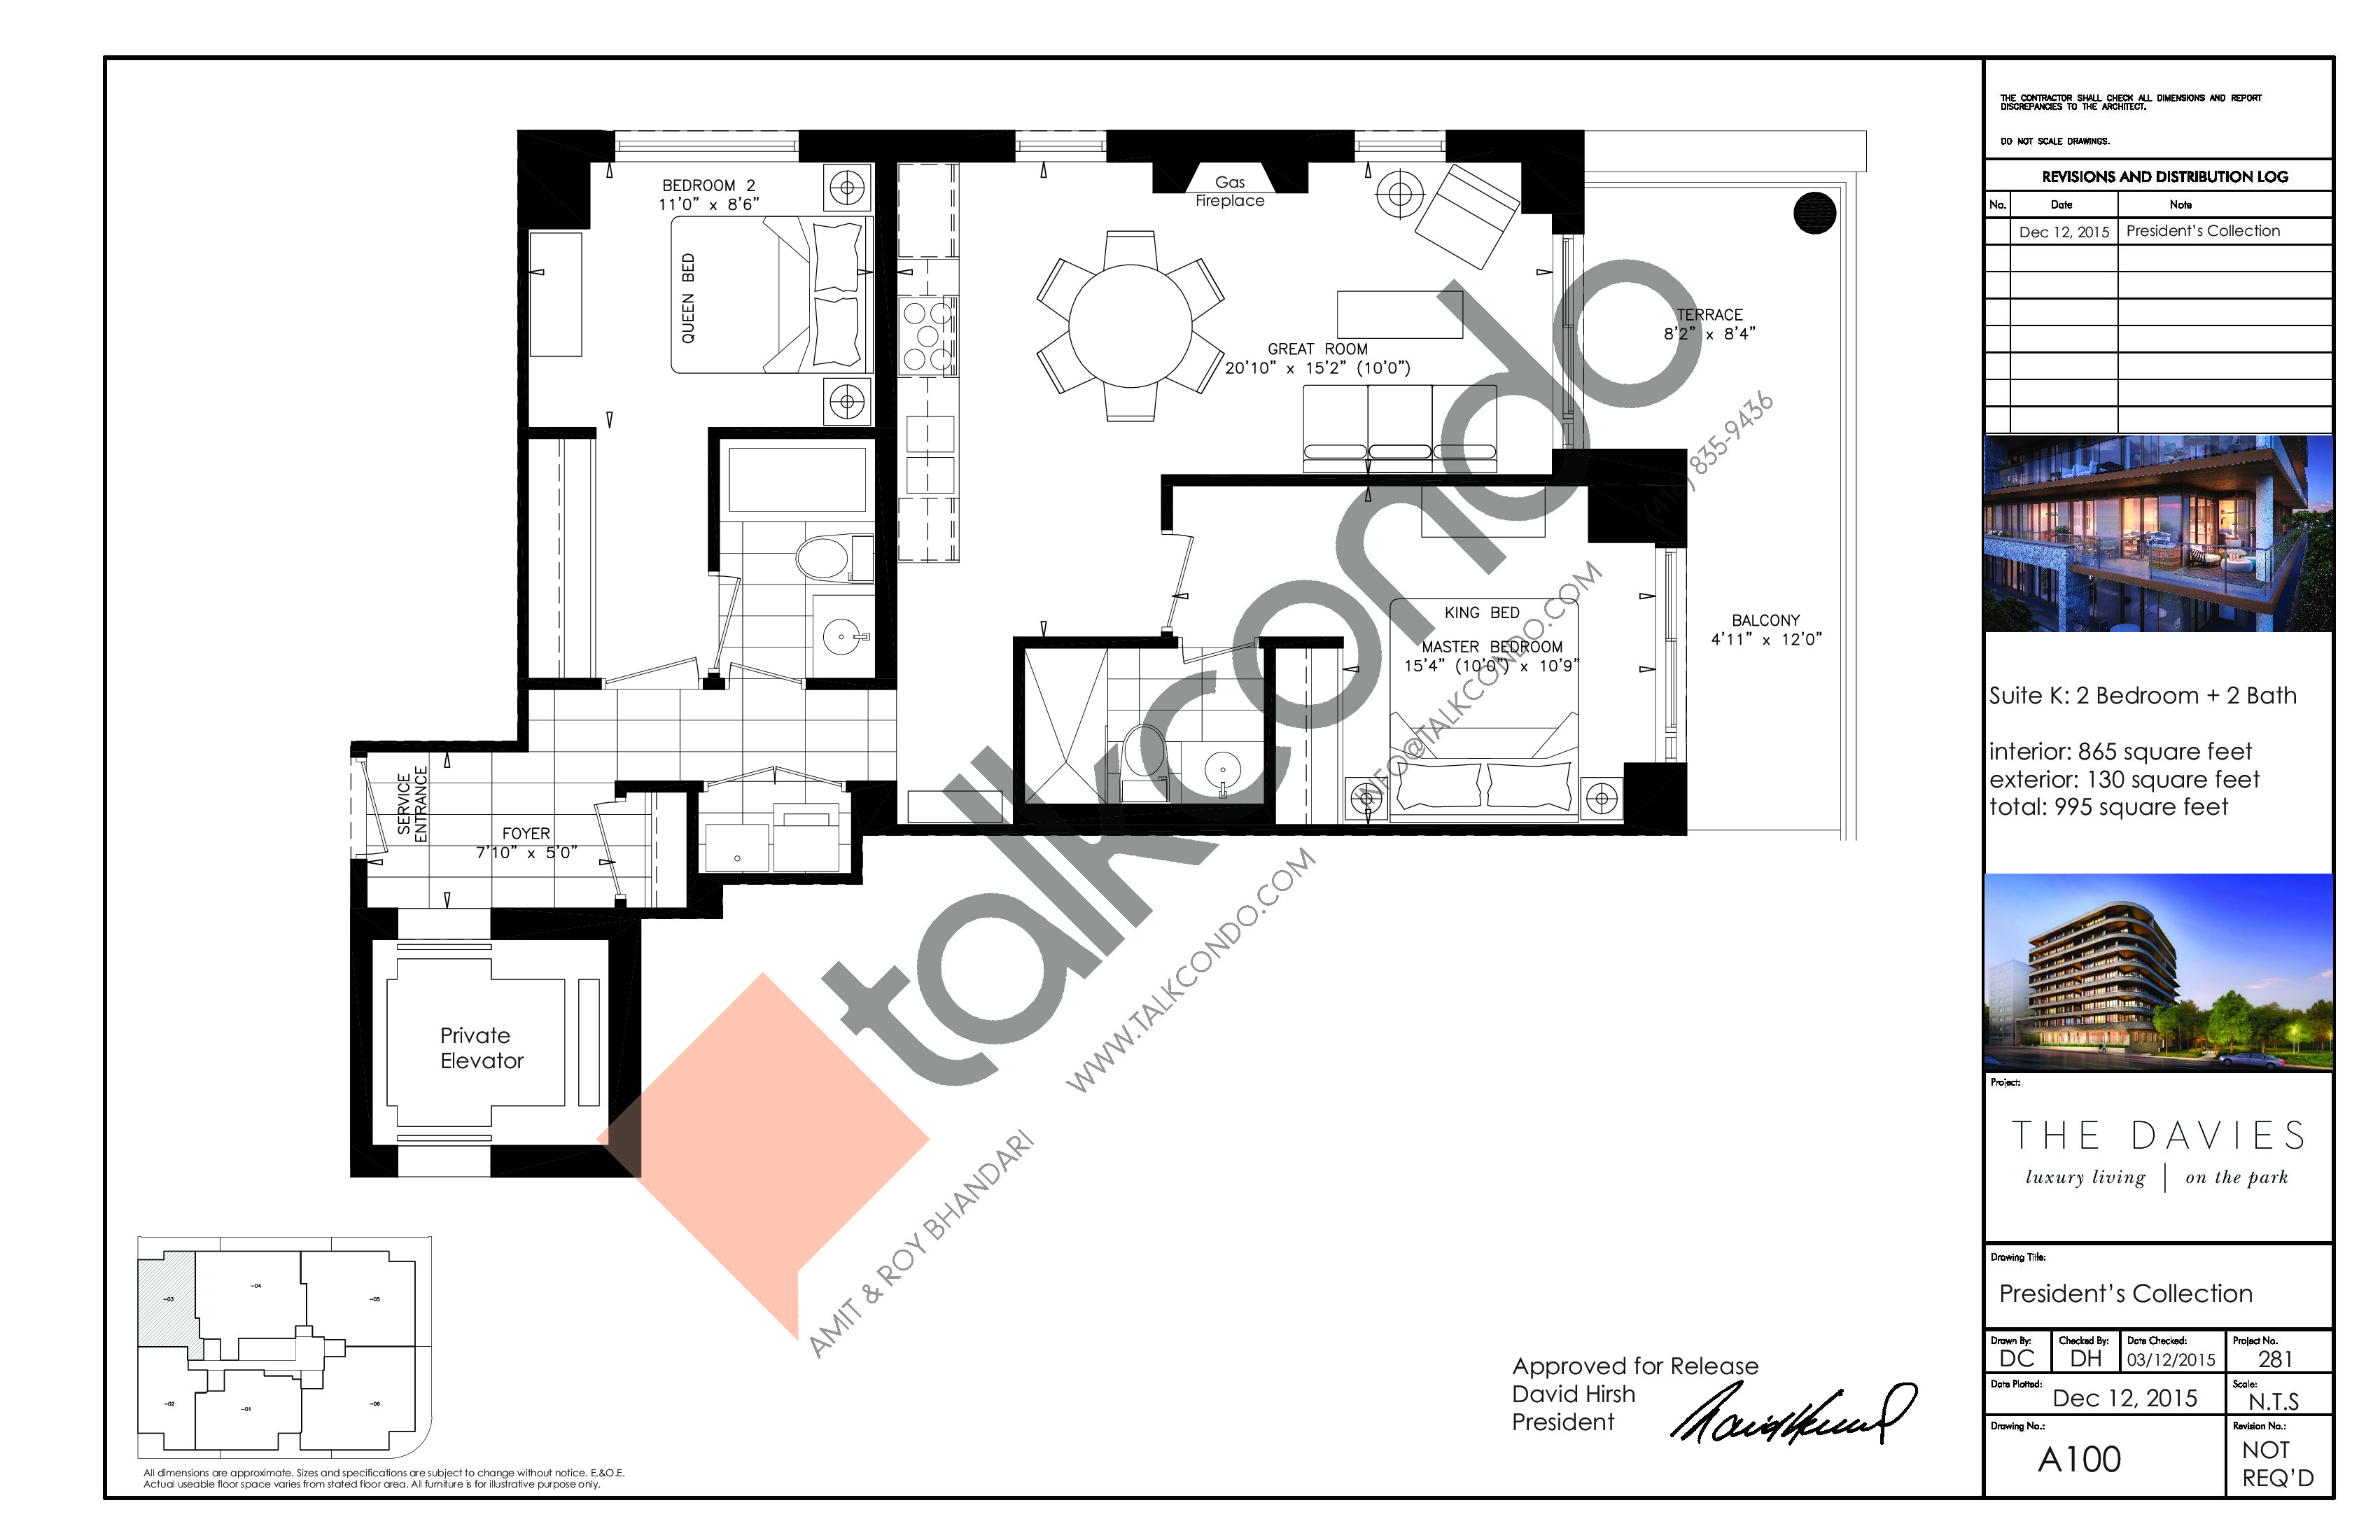 Suite K Floor Plan at The Davies - 865 sq.ft